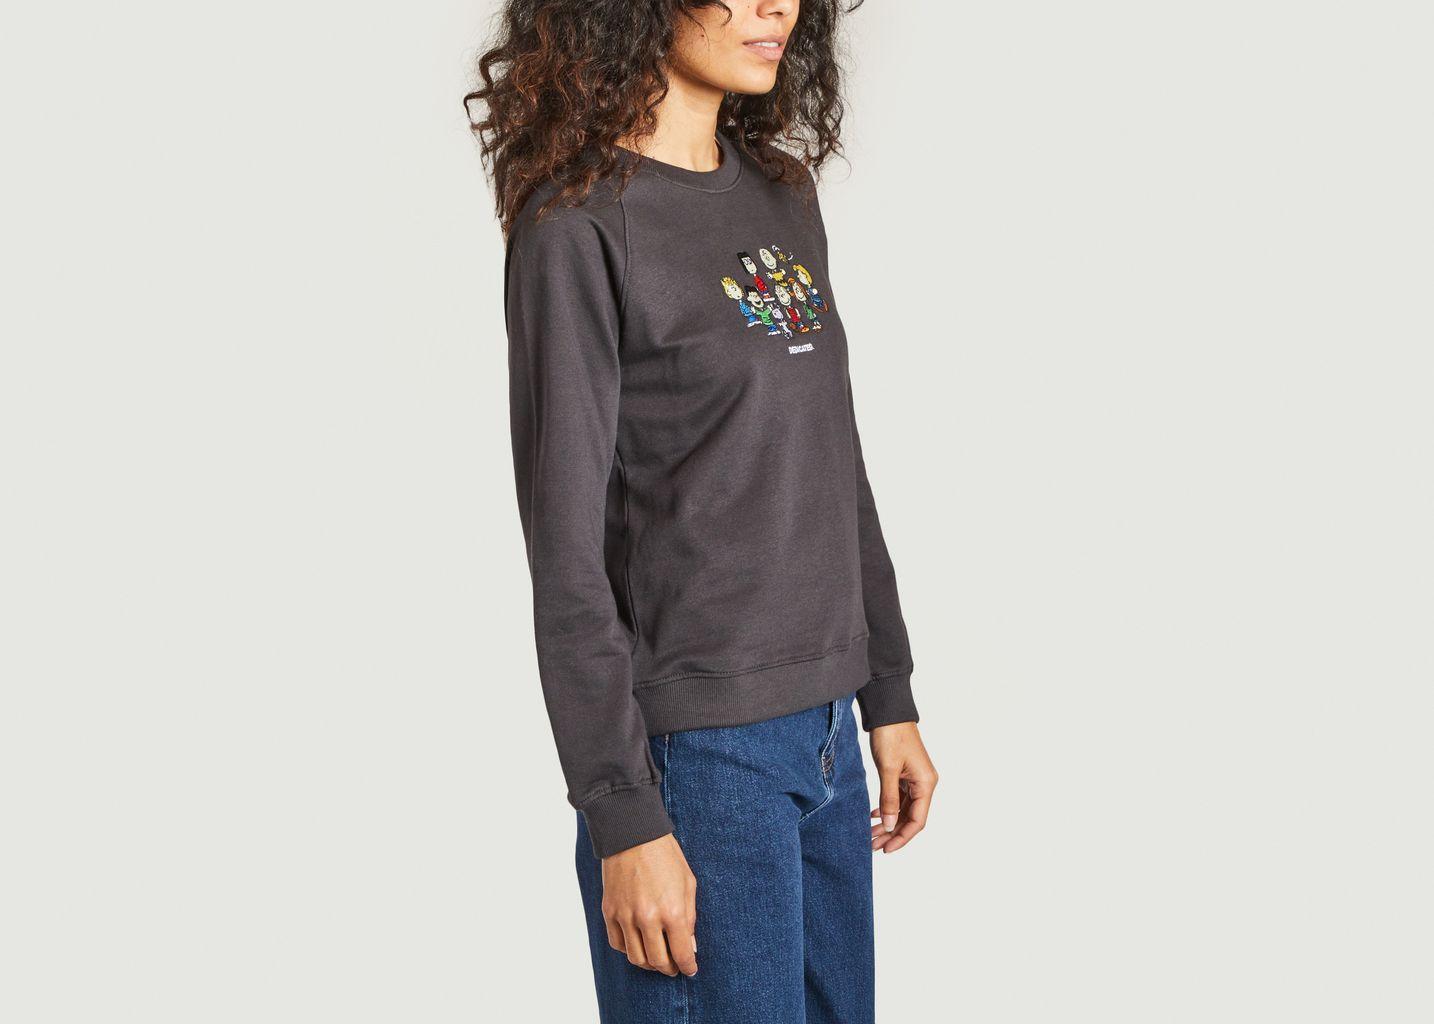 Sweatshirt Ystad Peanuts Friends Dedicated Brand x Snoopy - Dedicated Brand